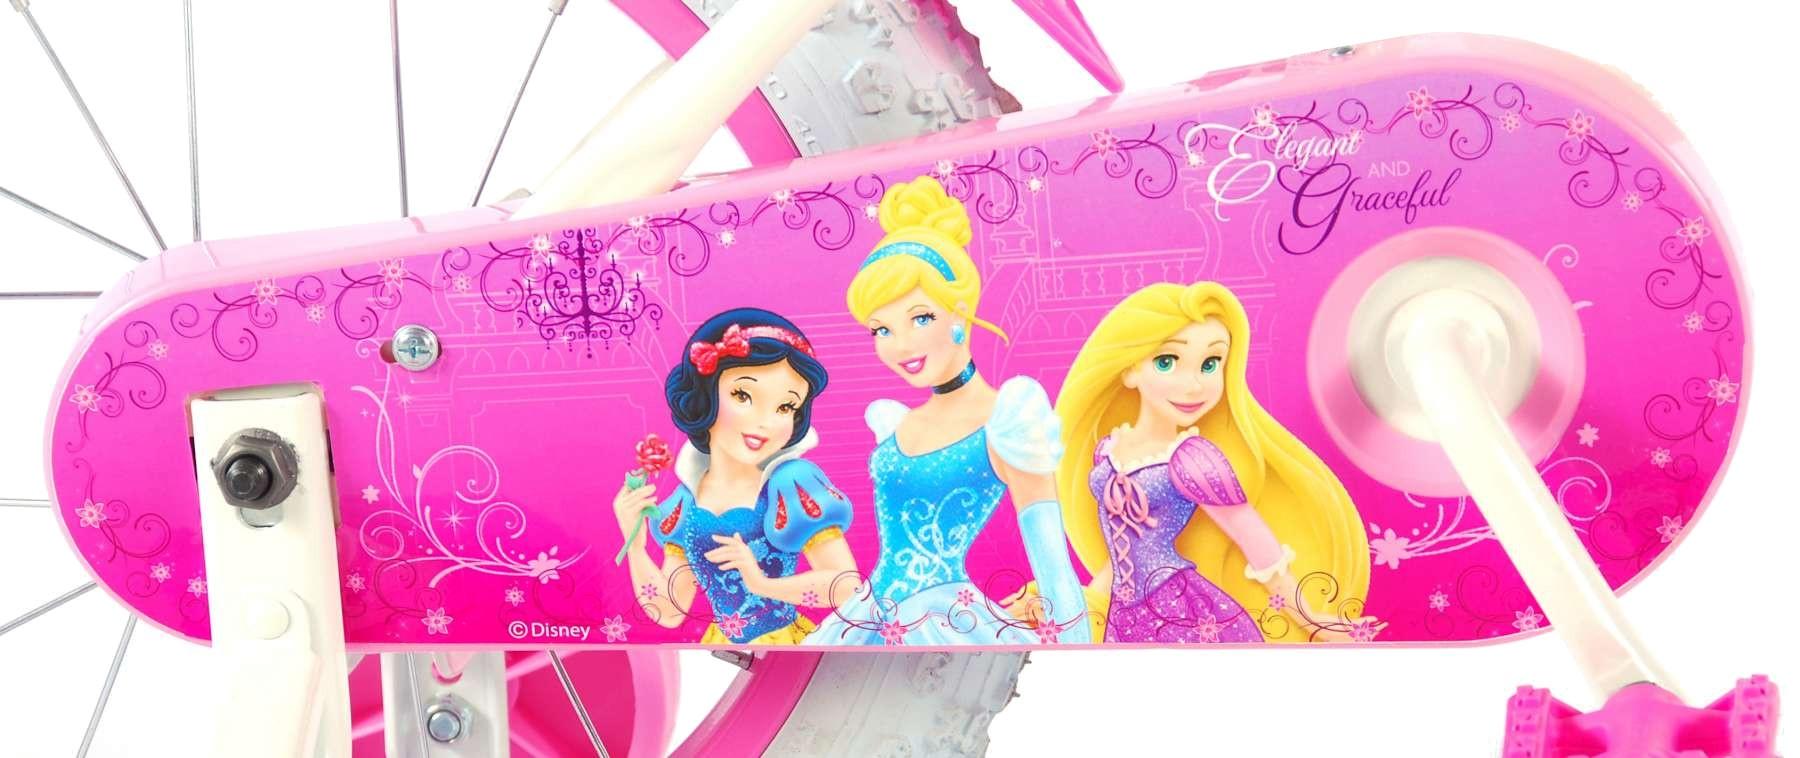 Disney Princess-S1 14 Zoll 23,5 cm Mädchen Rücktrittbremse Weiß/Rosa ...